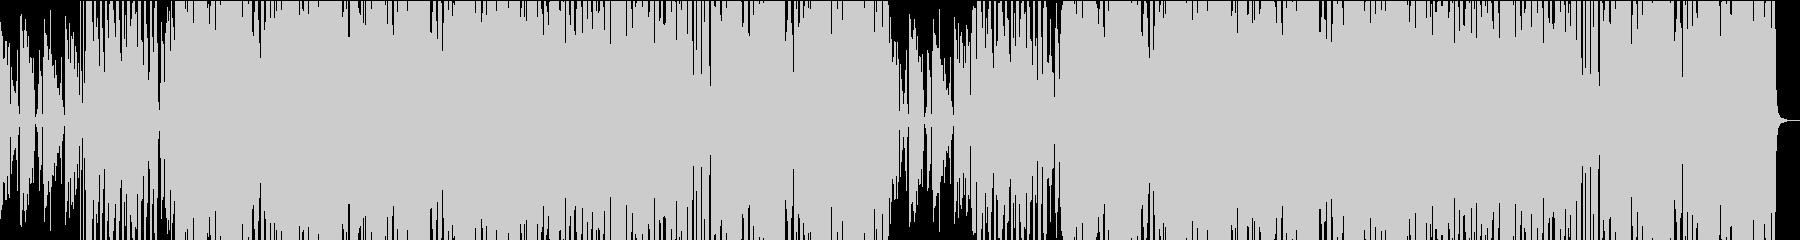 POPな70'~80'年代のディスコ風の未再生の波形